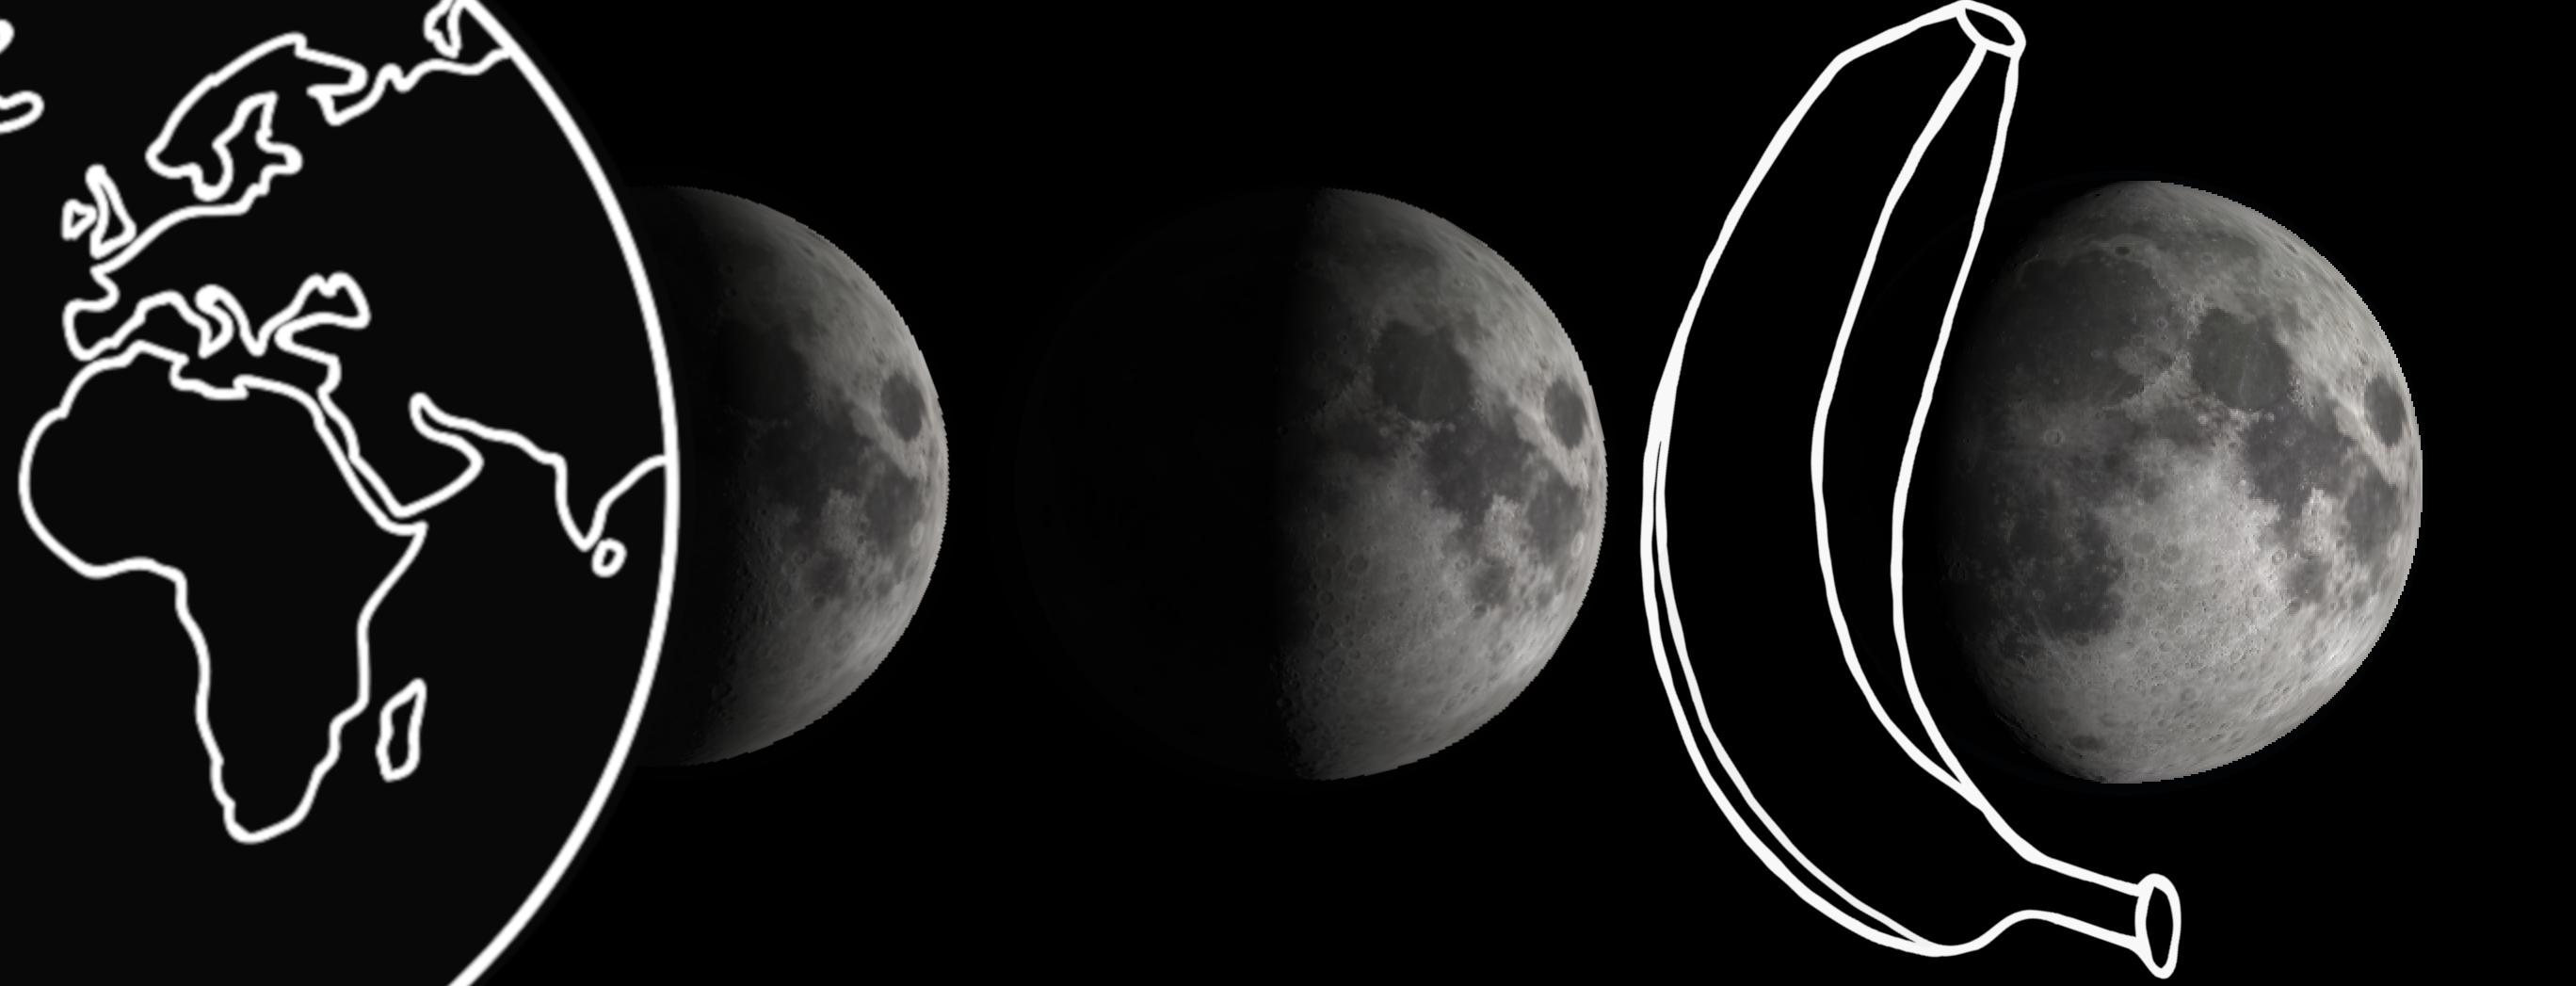 Illustration of three moon phases. (Daniel Brown)